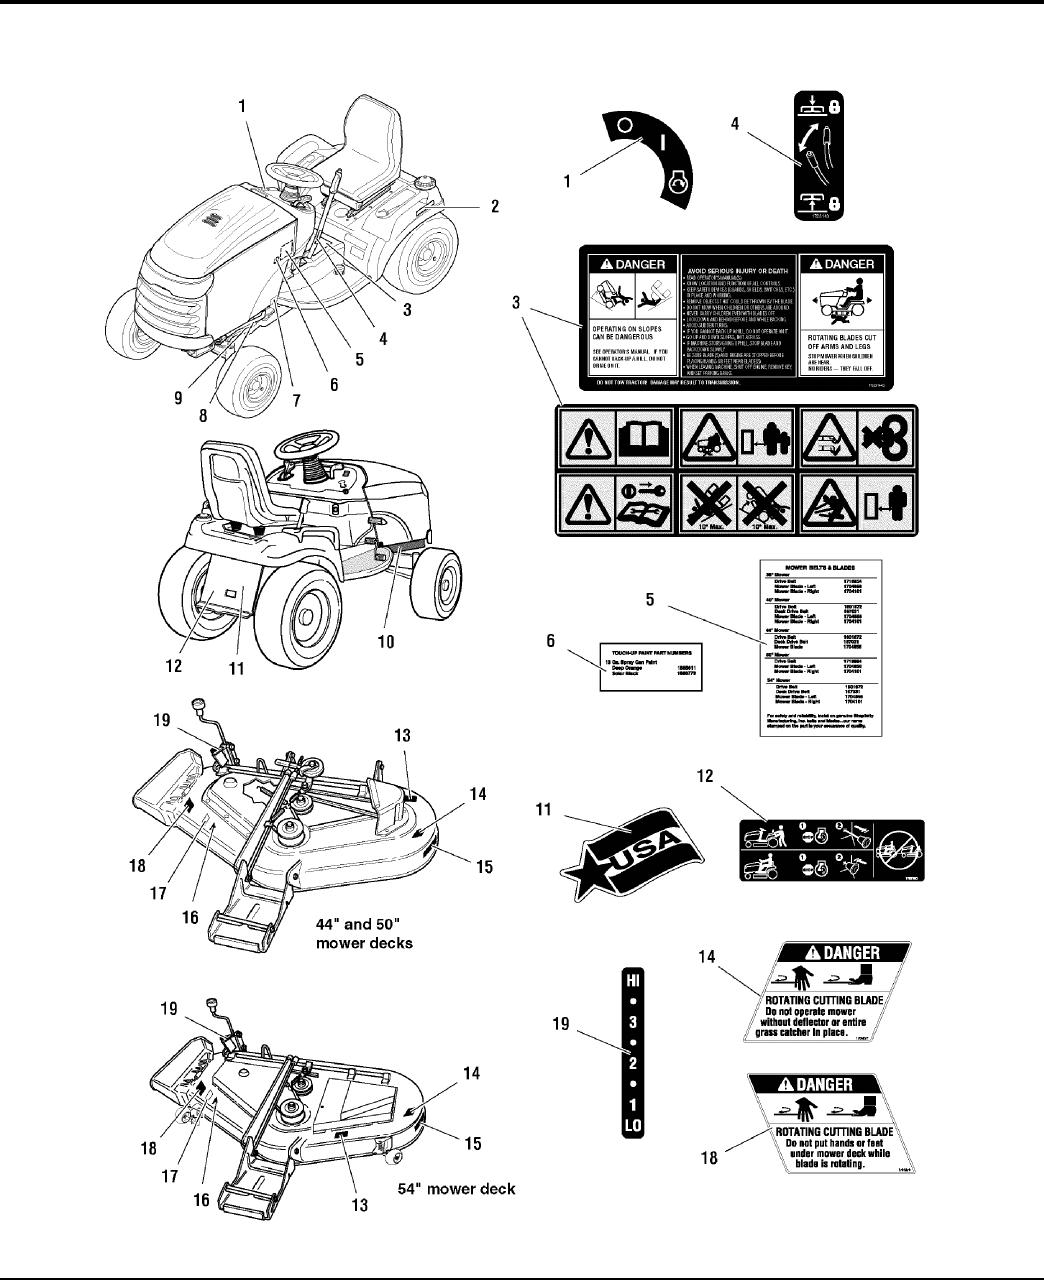 Wiring Simplicity Diagram Broadmoor 1693053 Expert Schematics Lawn Mower For 14 Ignition Legacy 4k Wiki